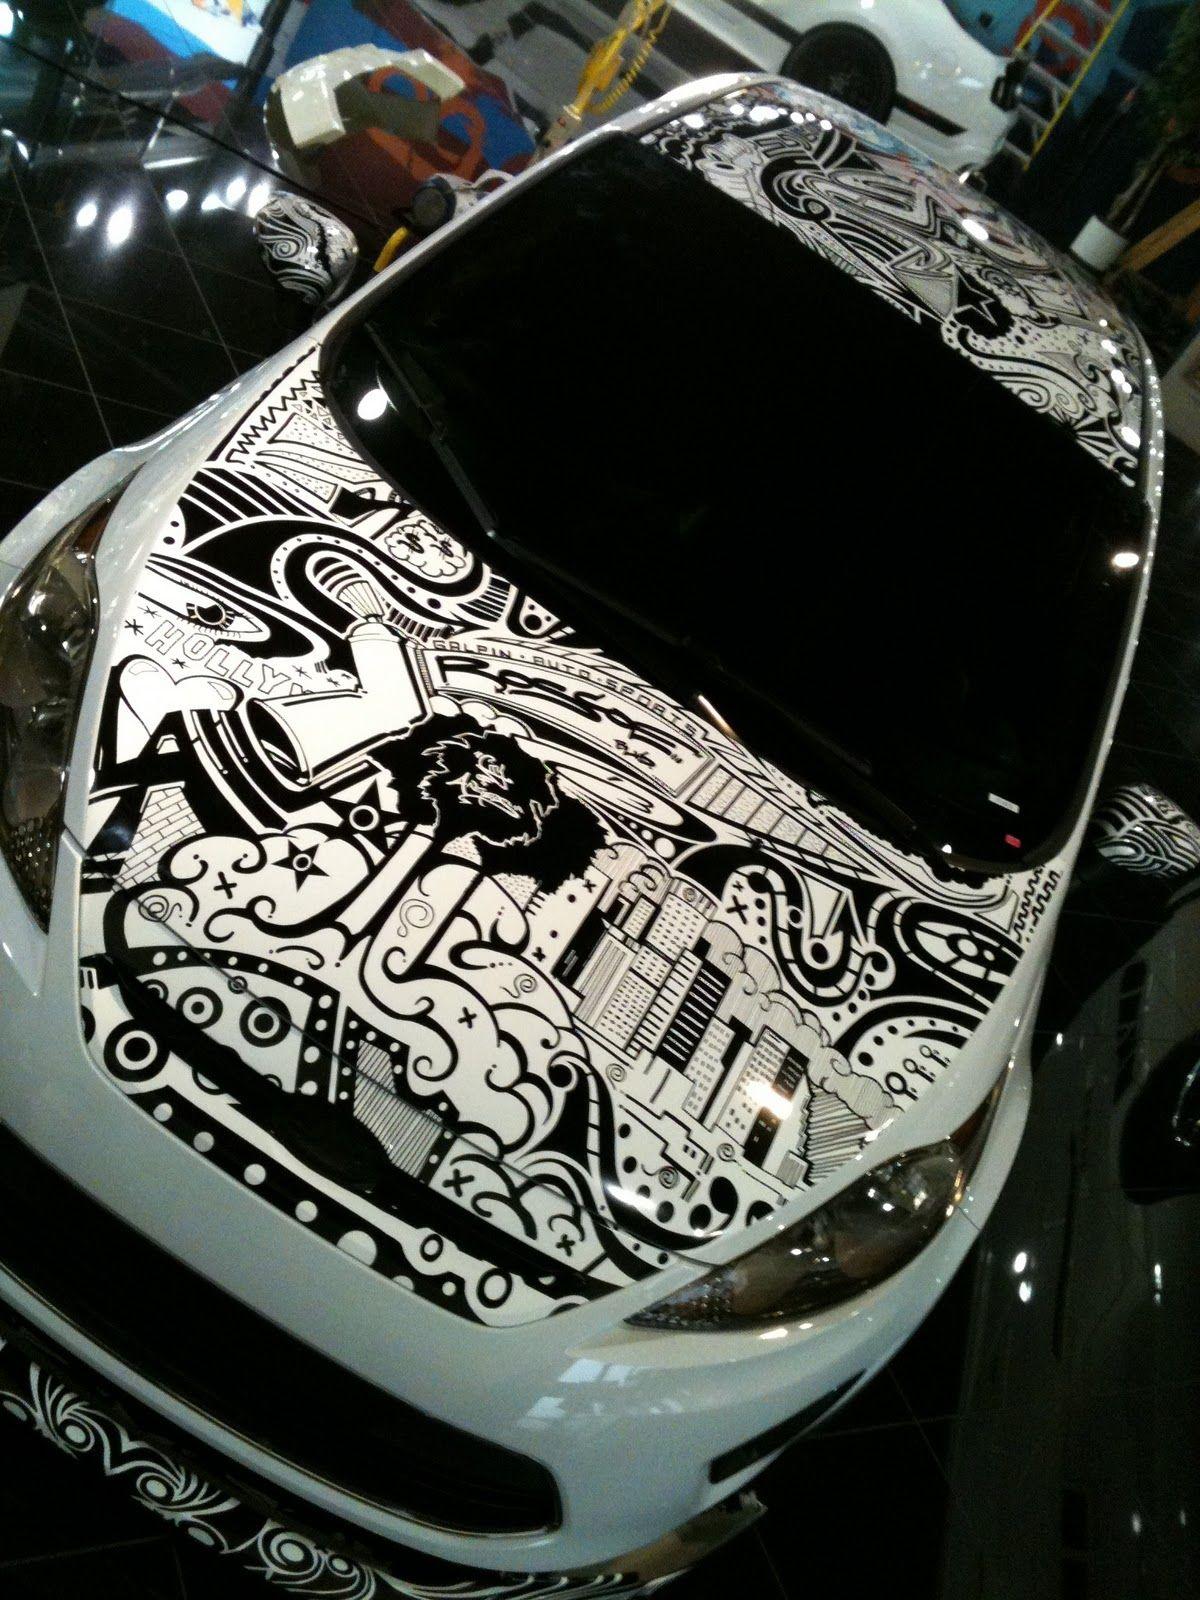 Sharpie Art Custom Car Decals Car Art [ 1600 x 1200 Pixel ]